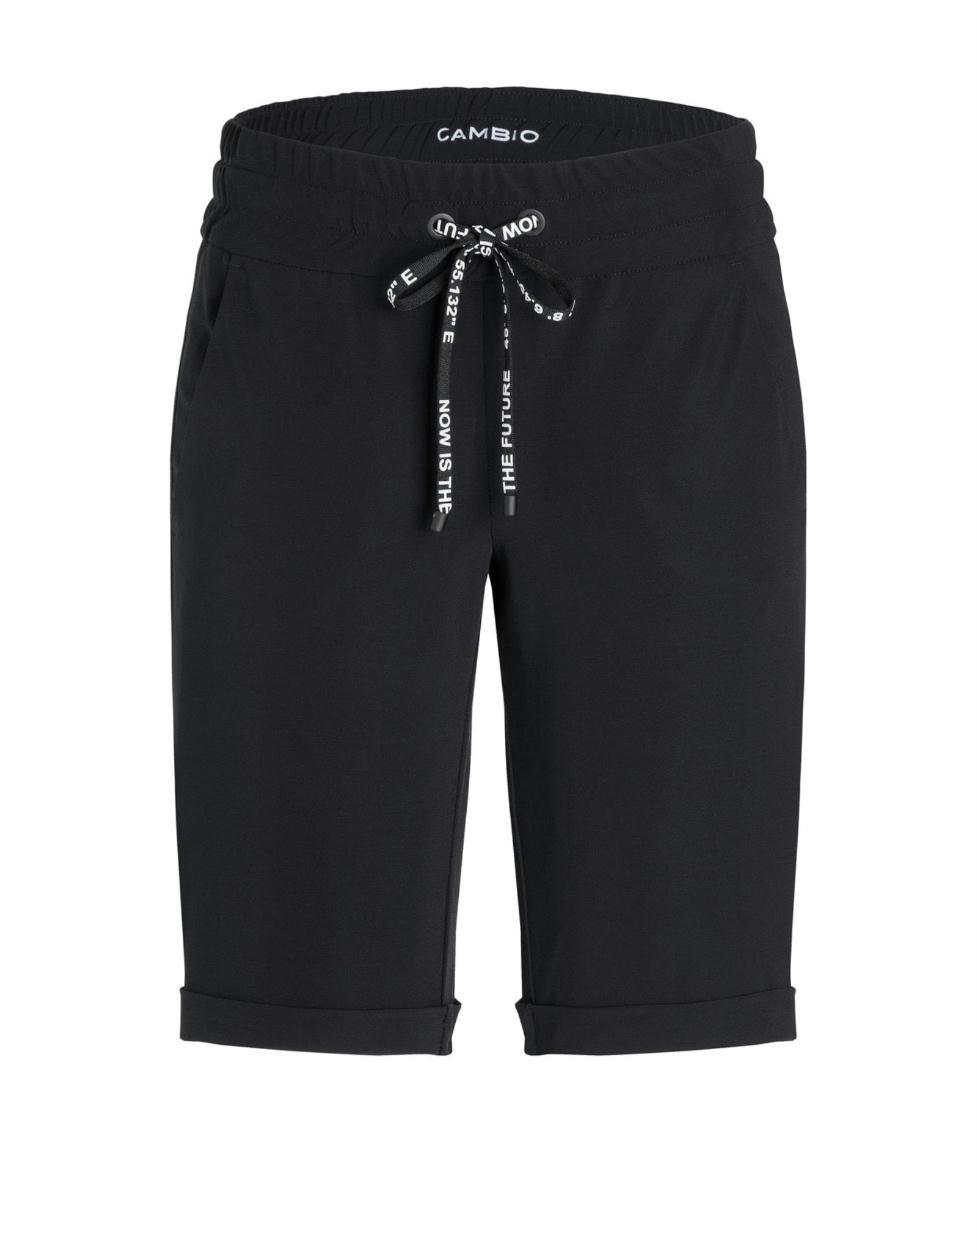 Cambio Black Jilian Shorts 6320